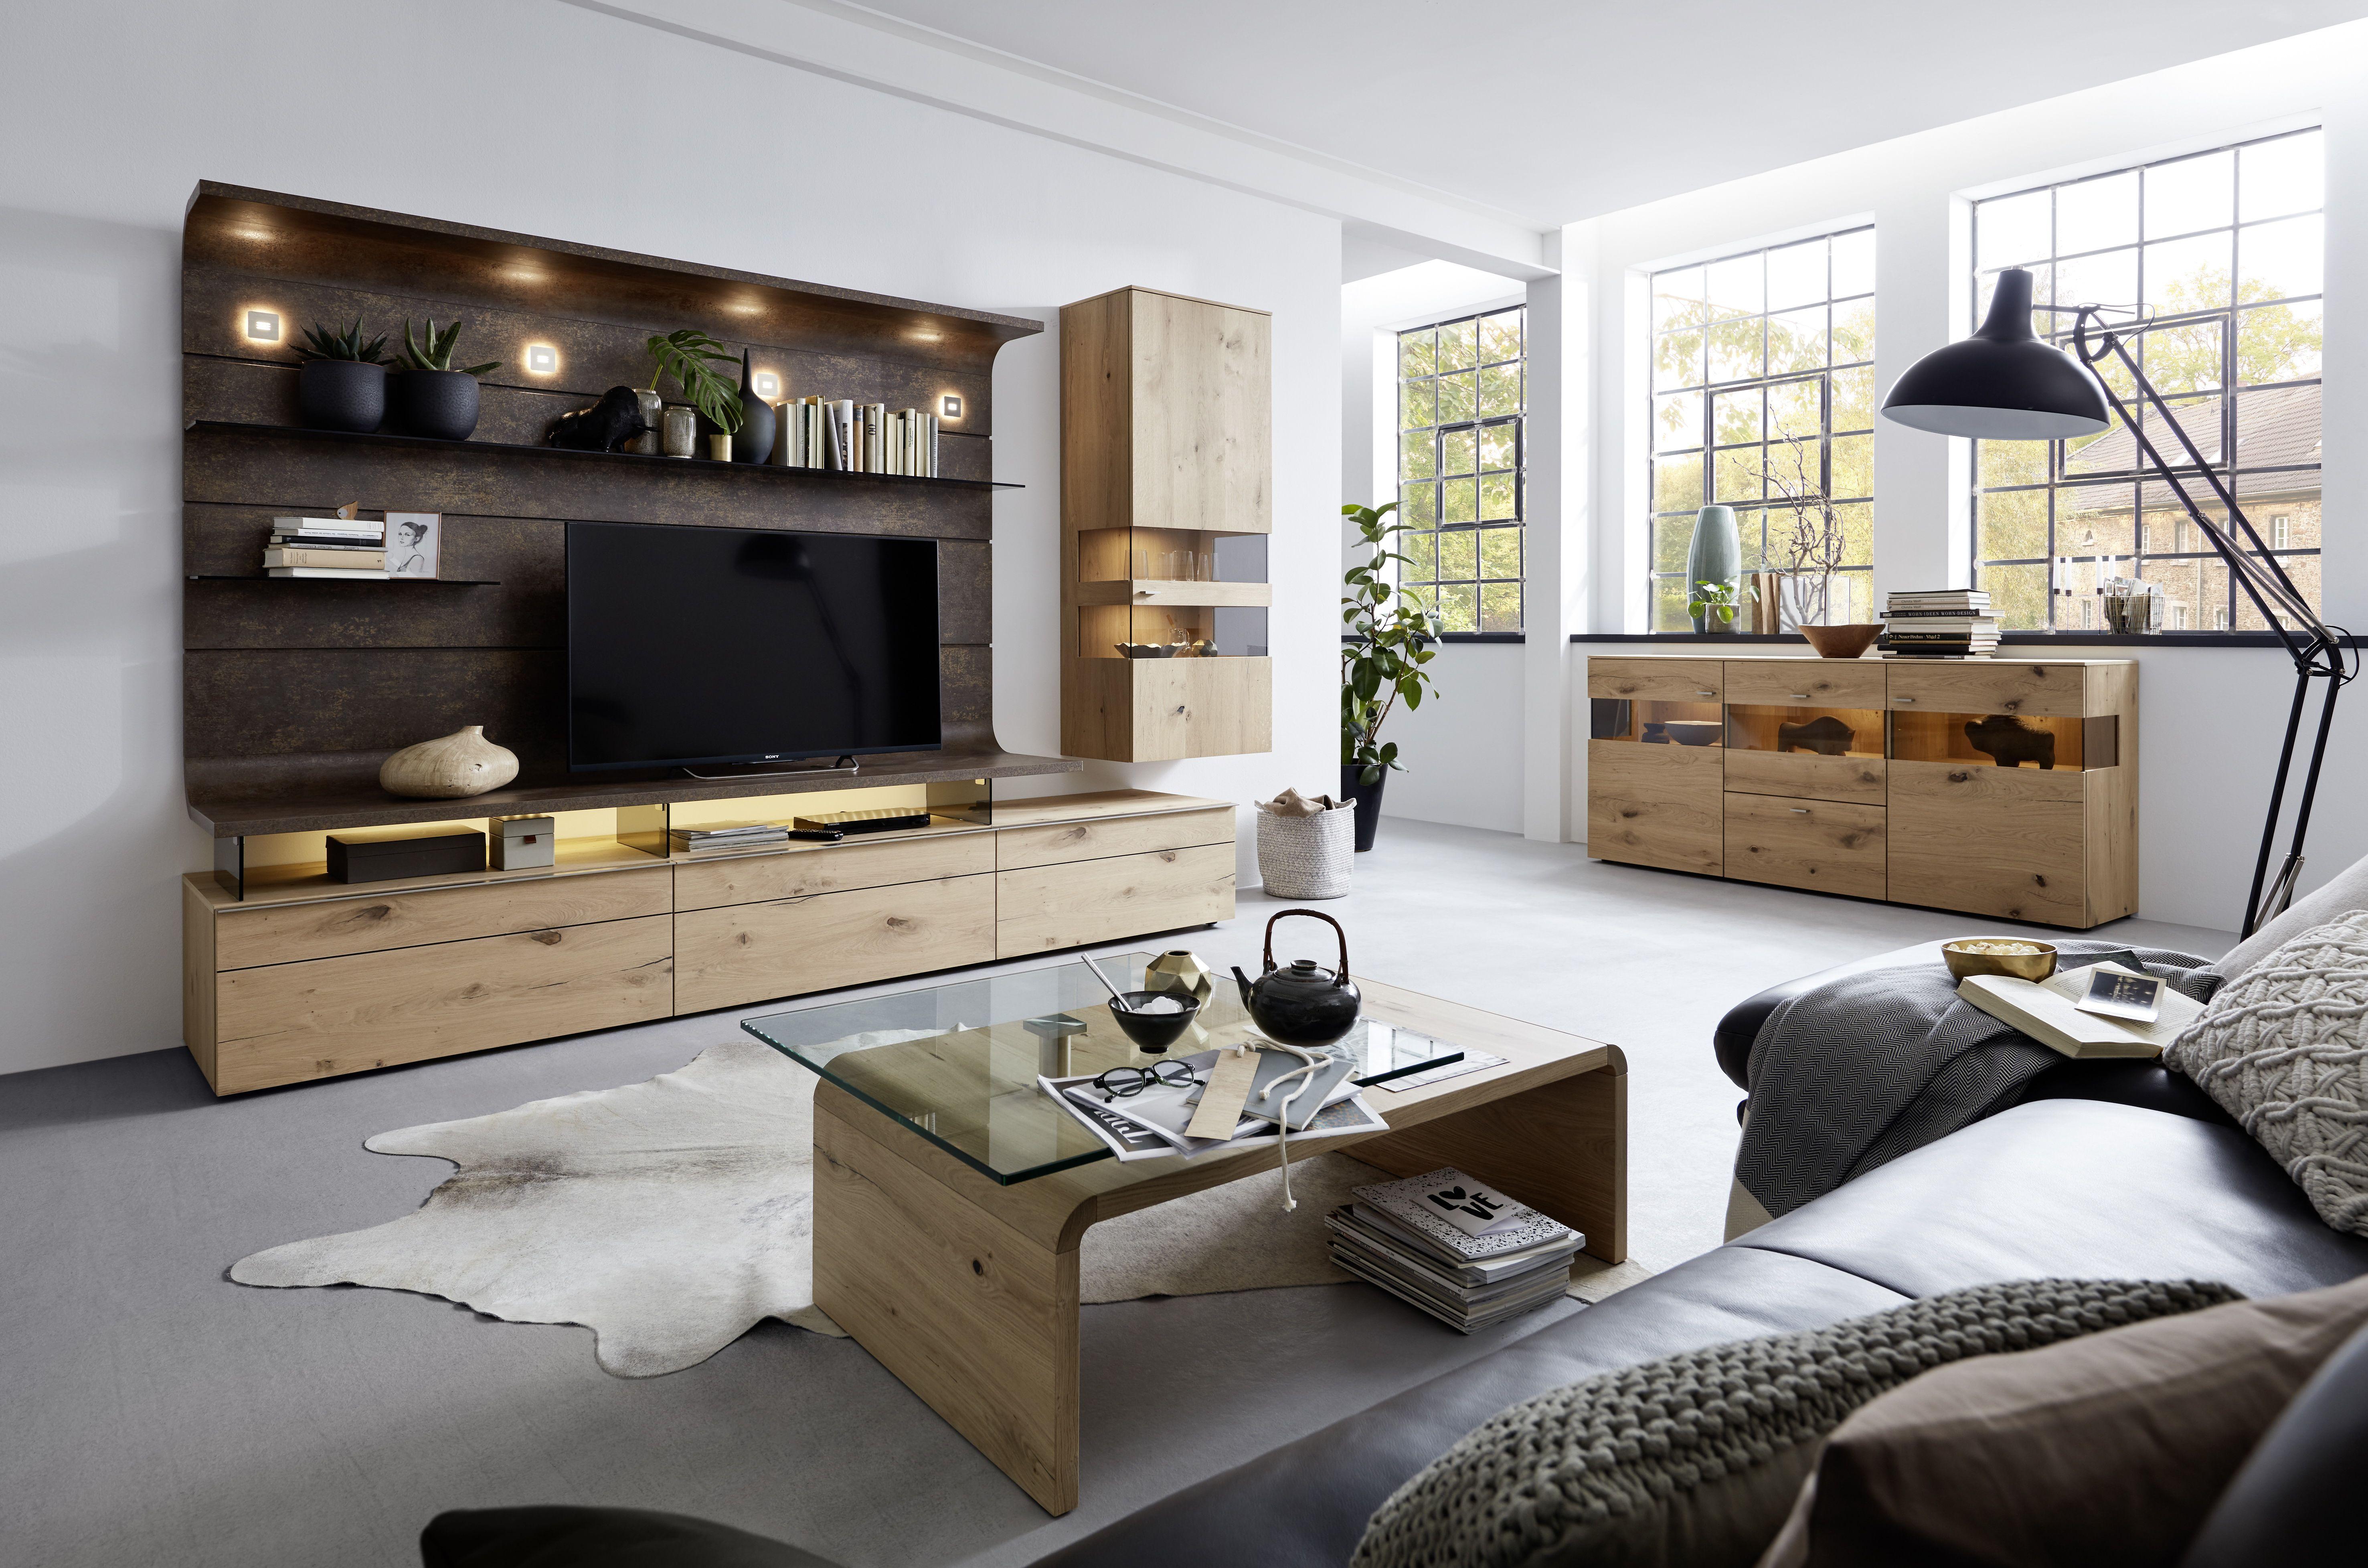 Wohnprogramm Treviso Mobel Madeingermany Furniture Gwinner